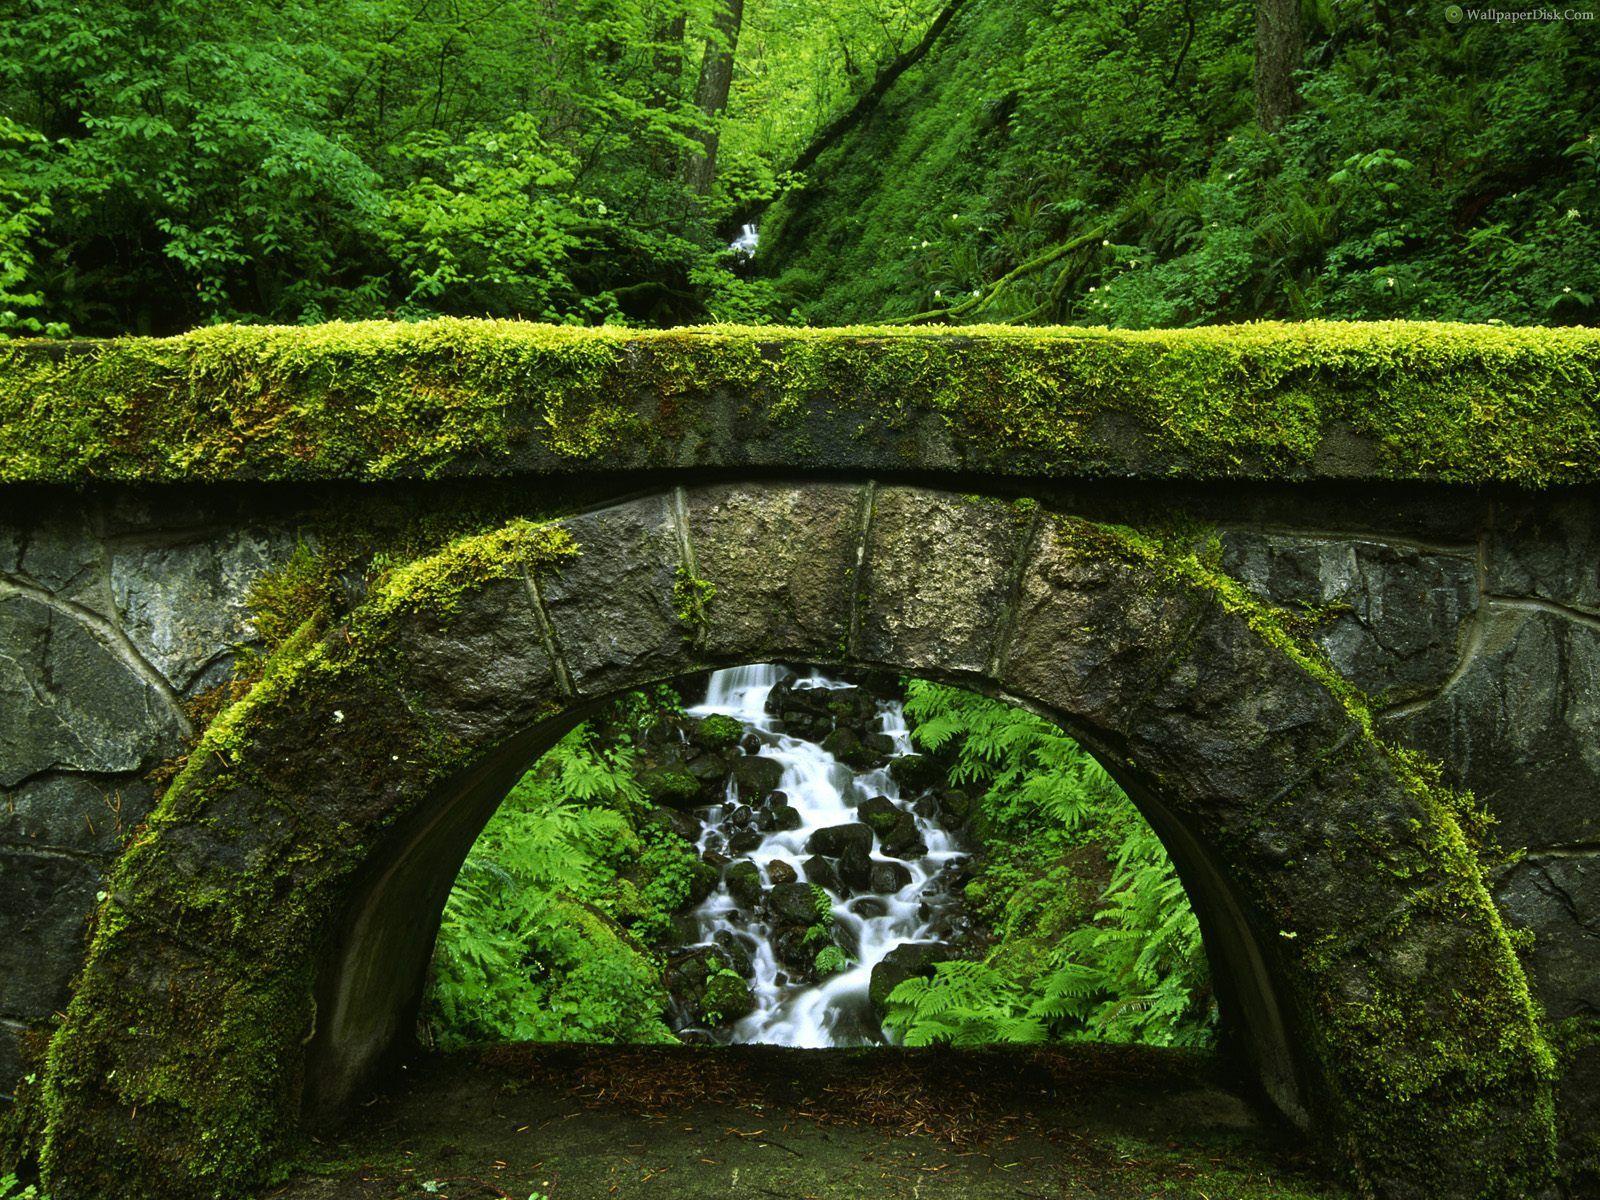 nature scenes | 30 most beautiful nature wallpapers hd | manmade vs